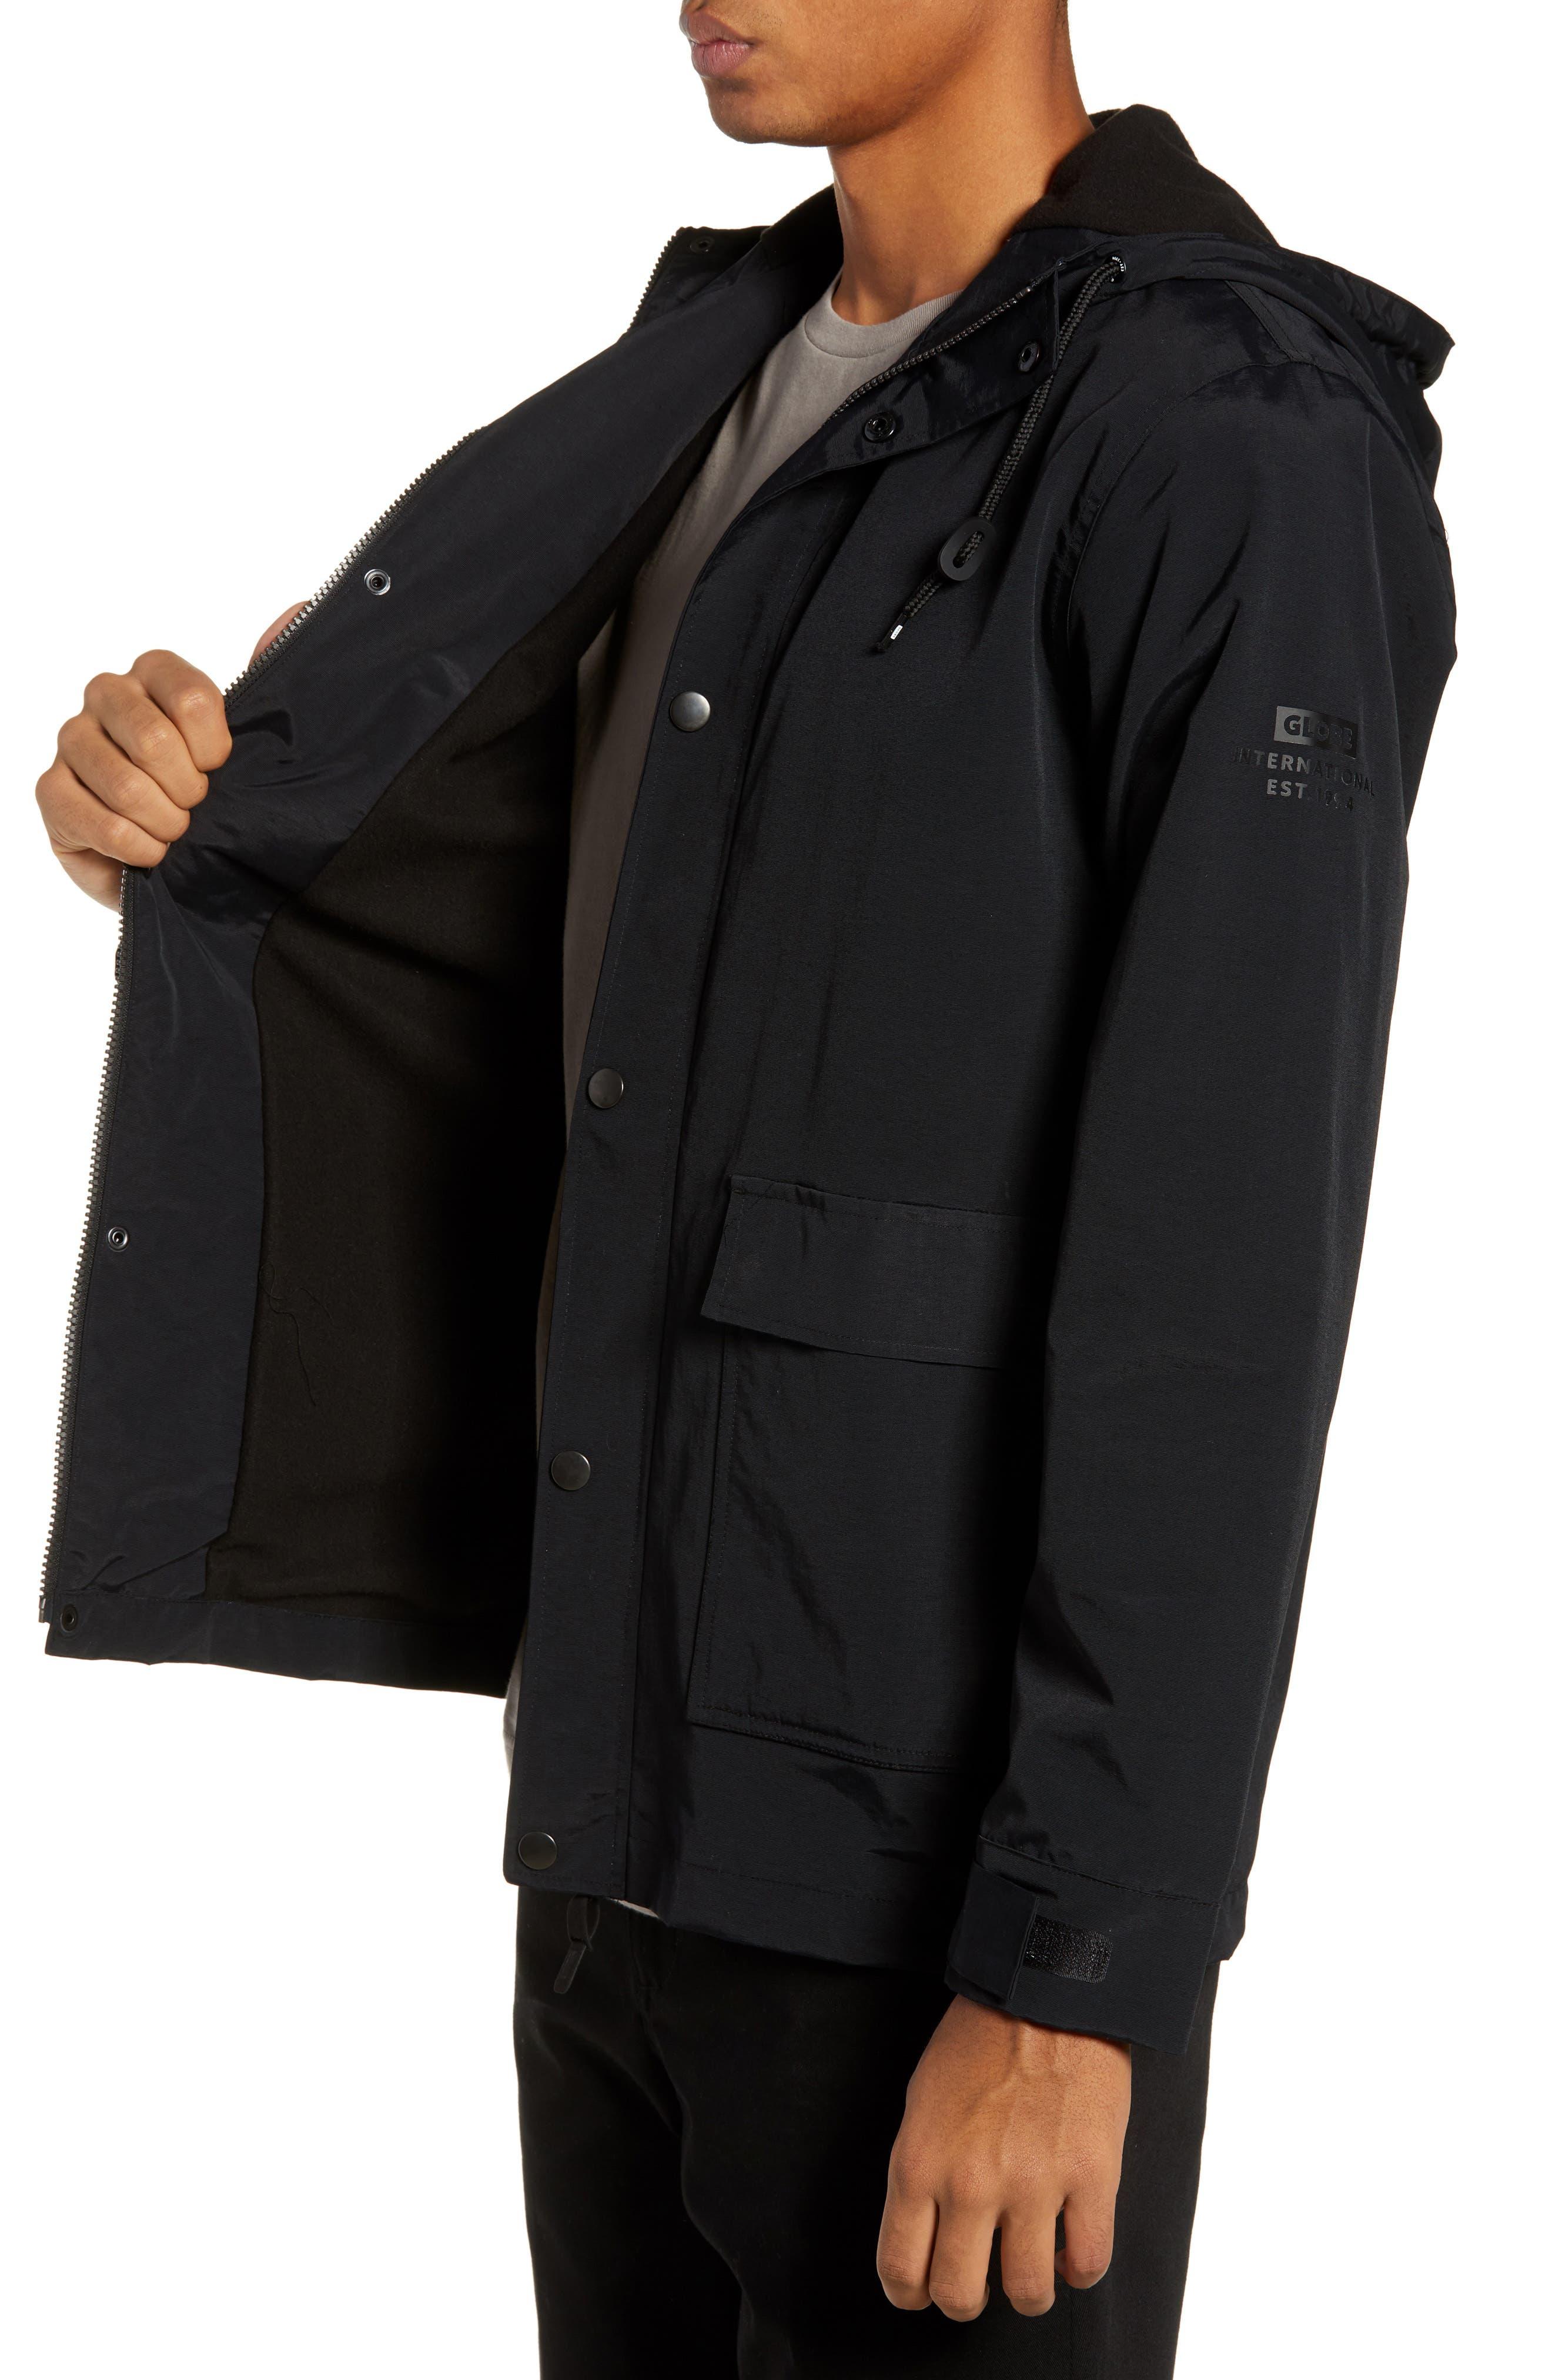 Goodstock Utility Jacket,                             Alternate thumbnail 3, color,                             BLACK